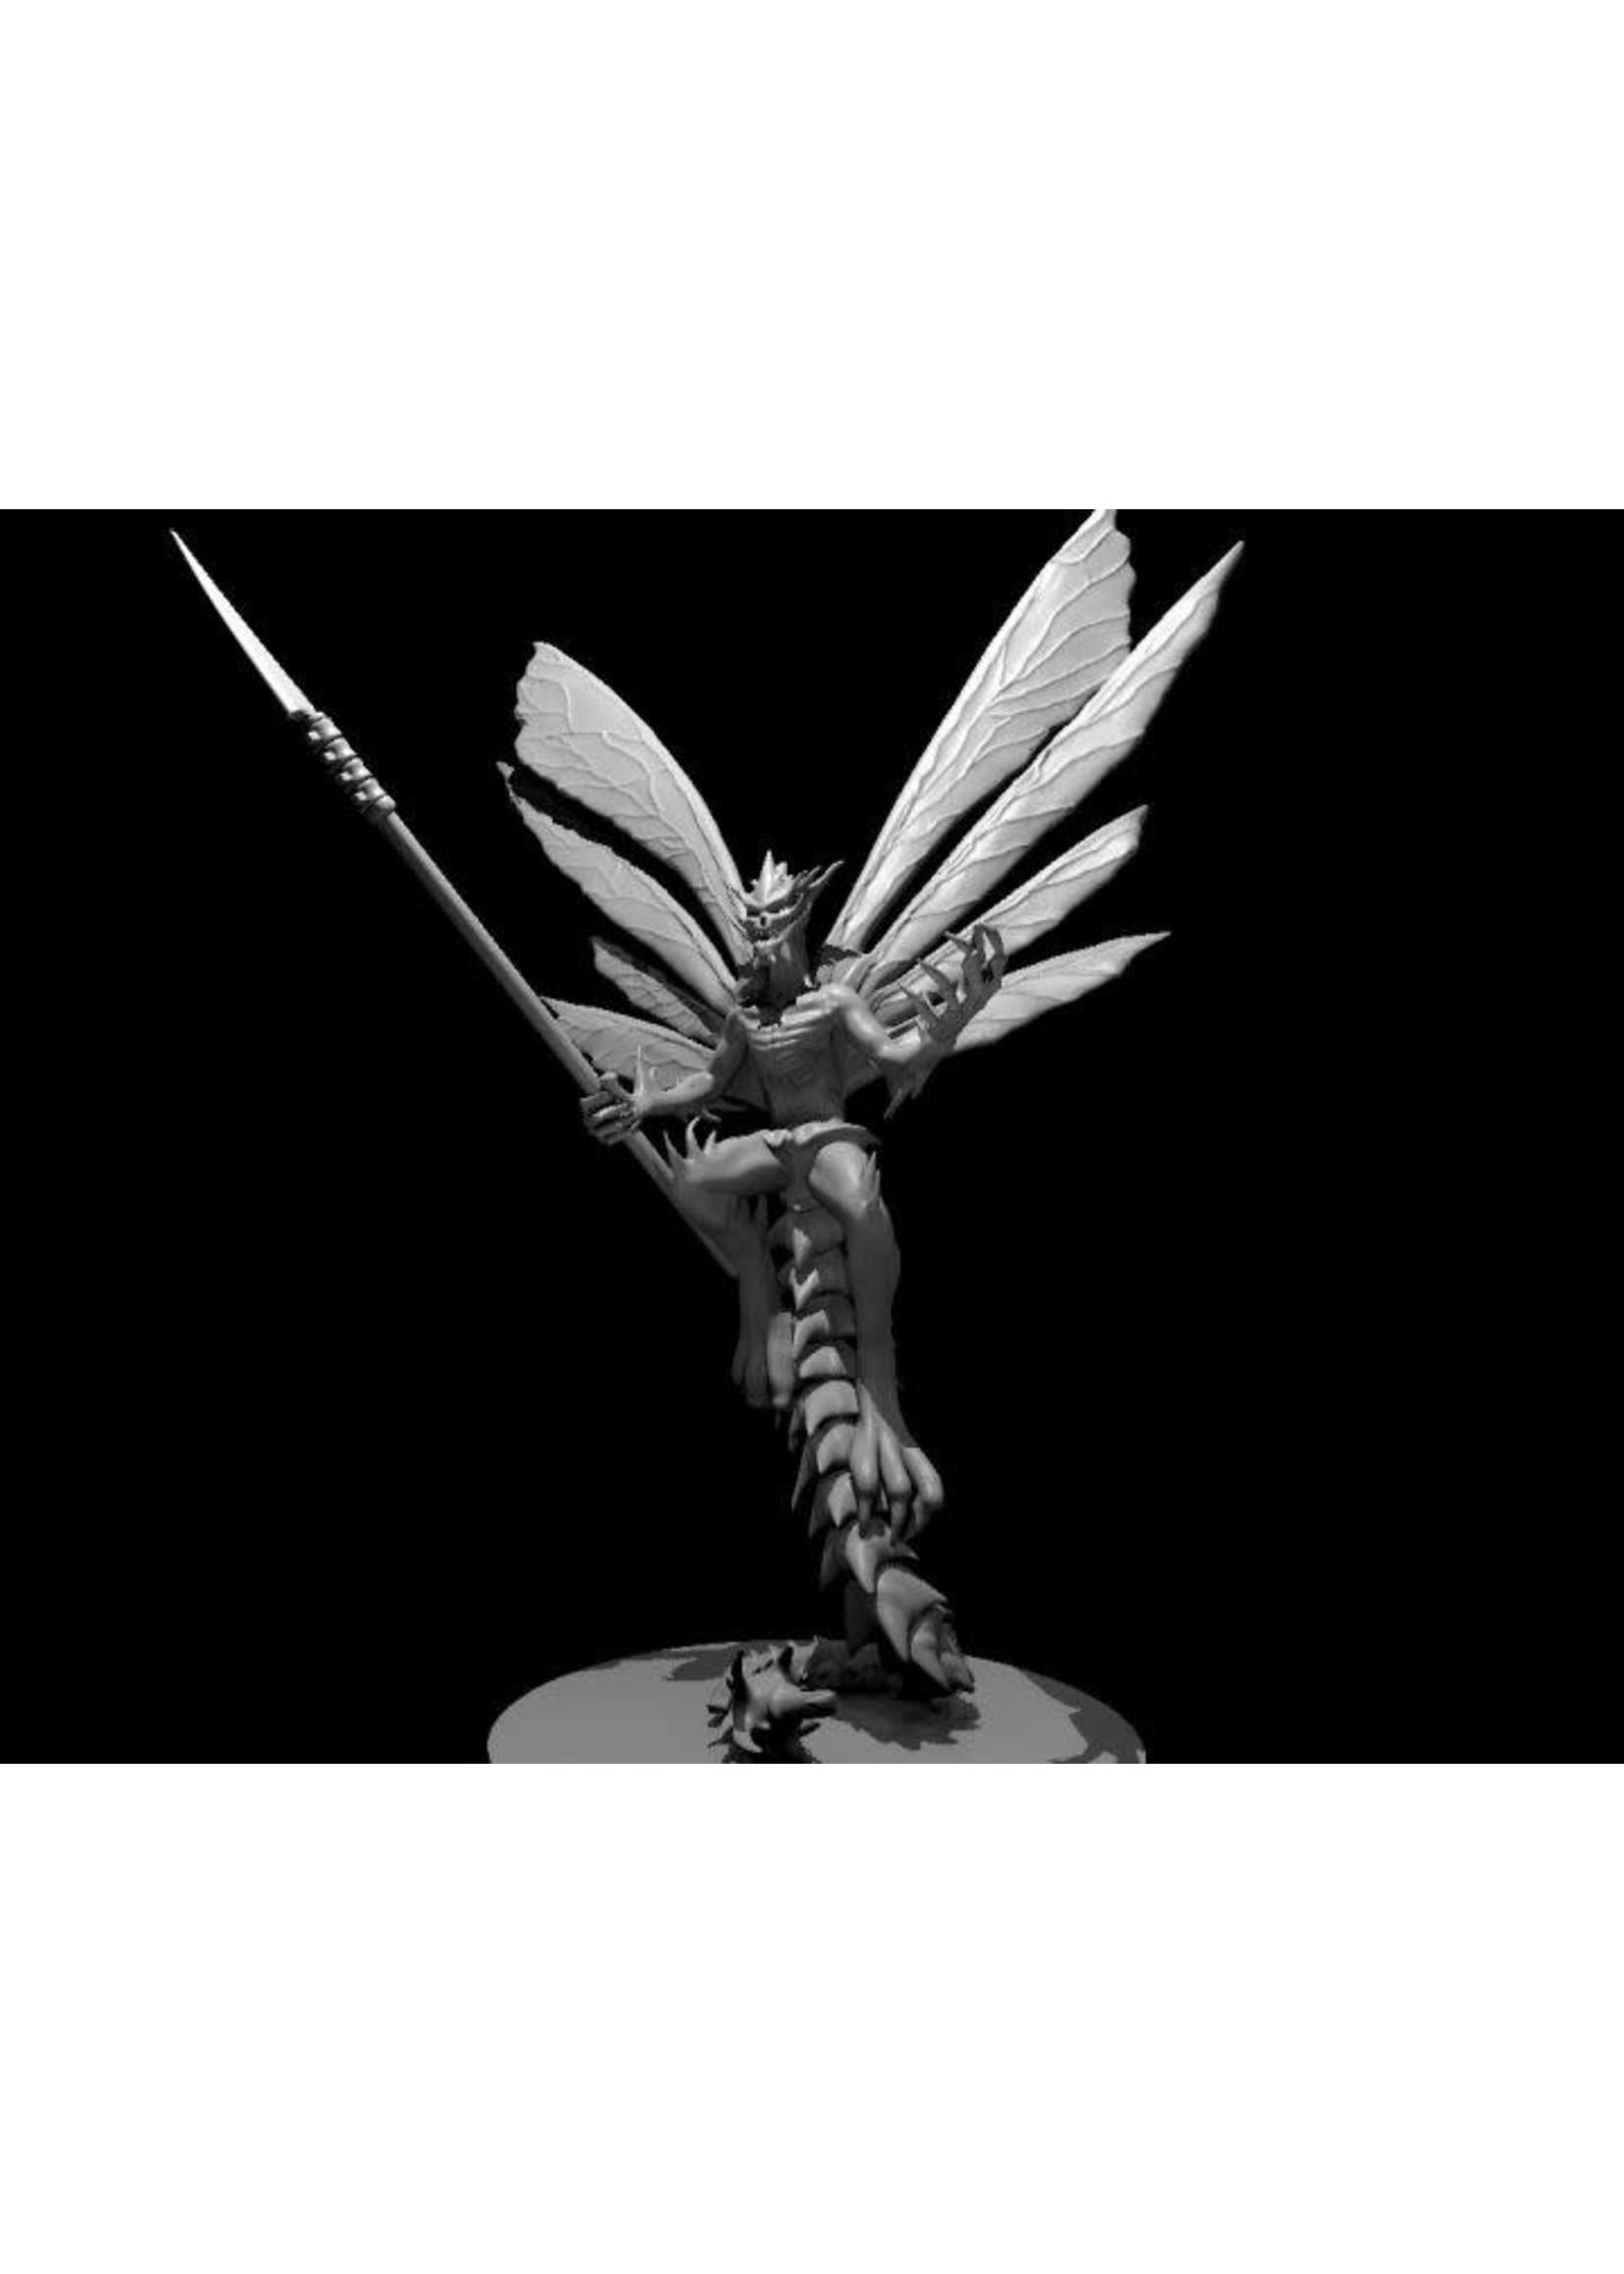 Bone Devil Flying With Polearm (Patreon Mz4250)